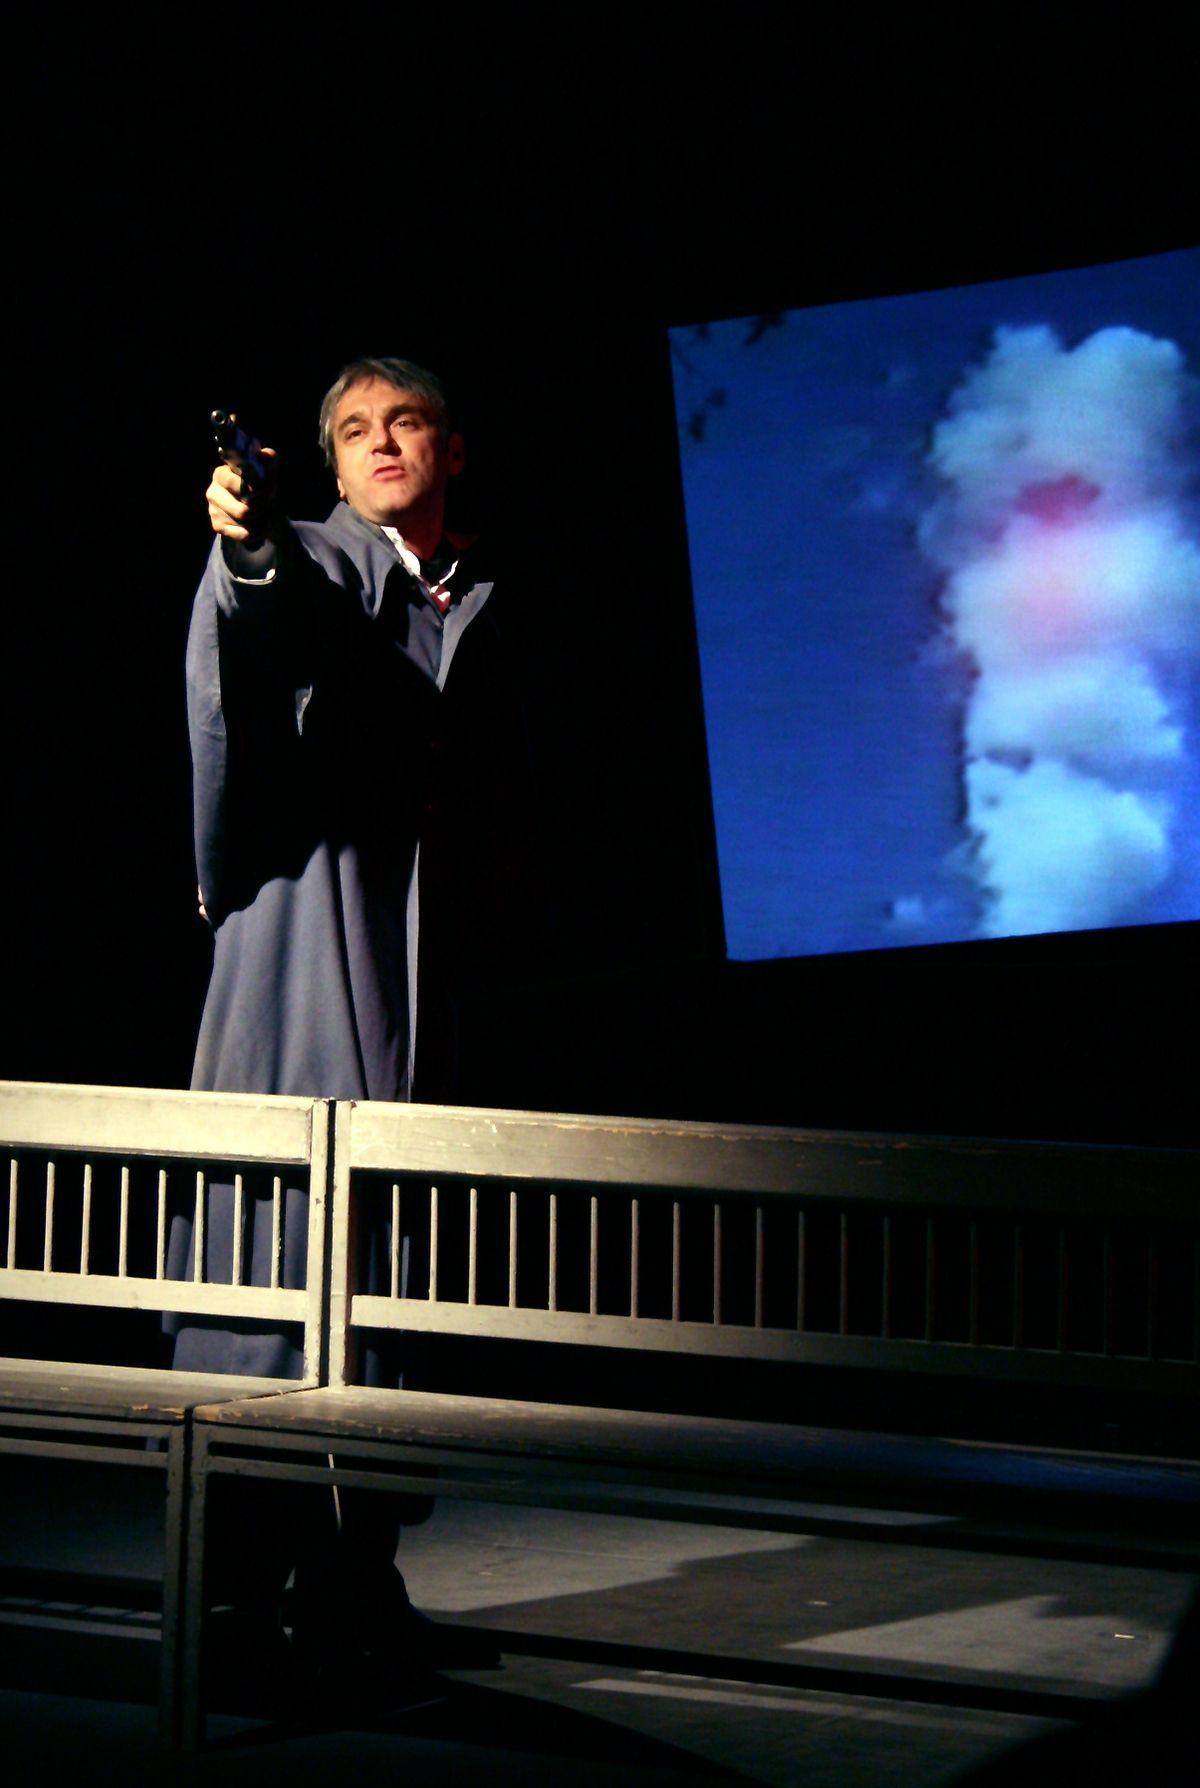 Спектакль «Повести Белкина» в Театре имени А. С. Пушкина фото 3